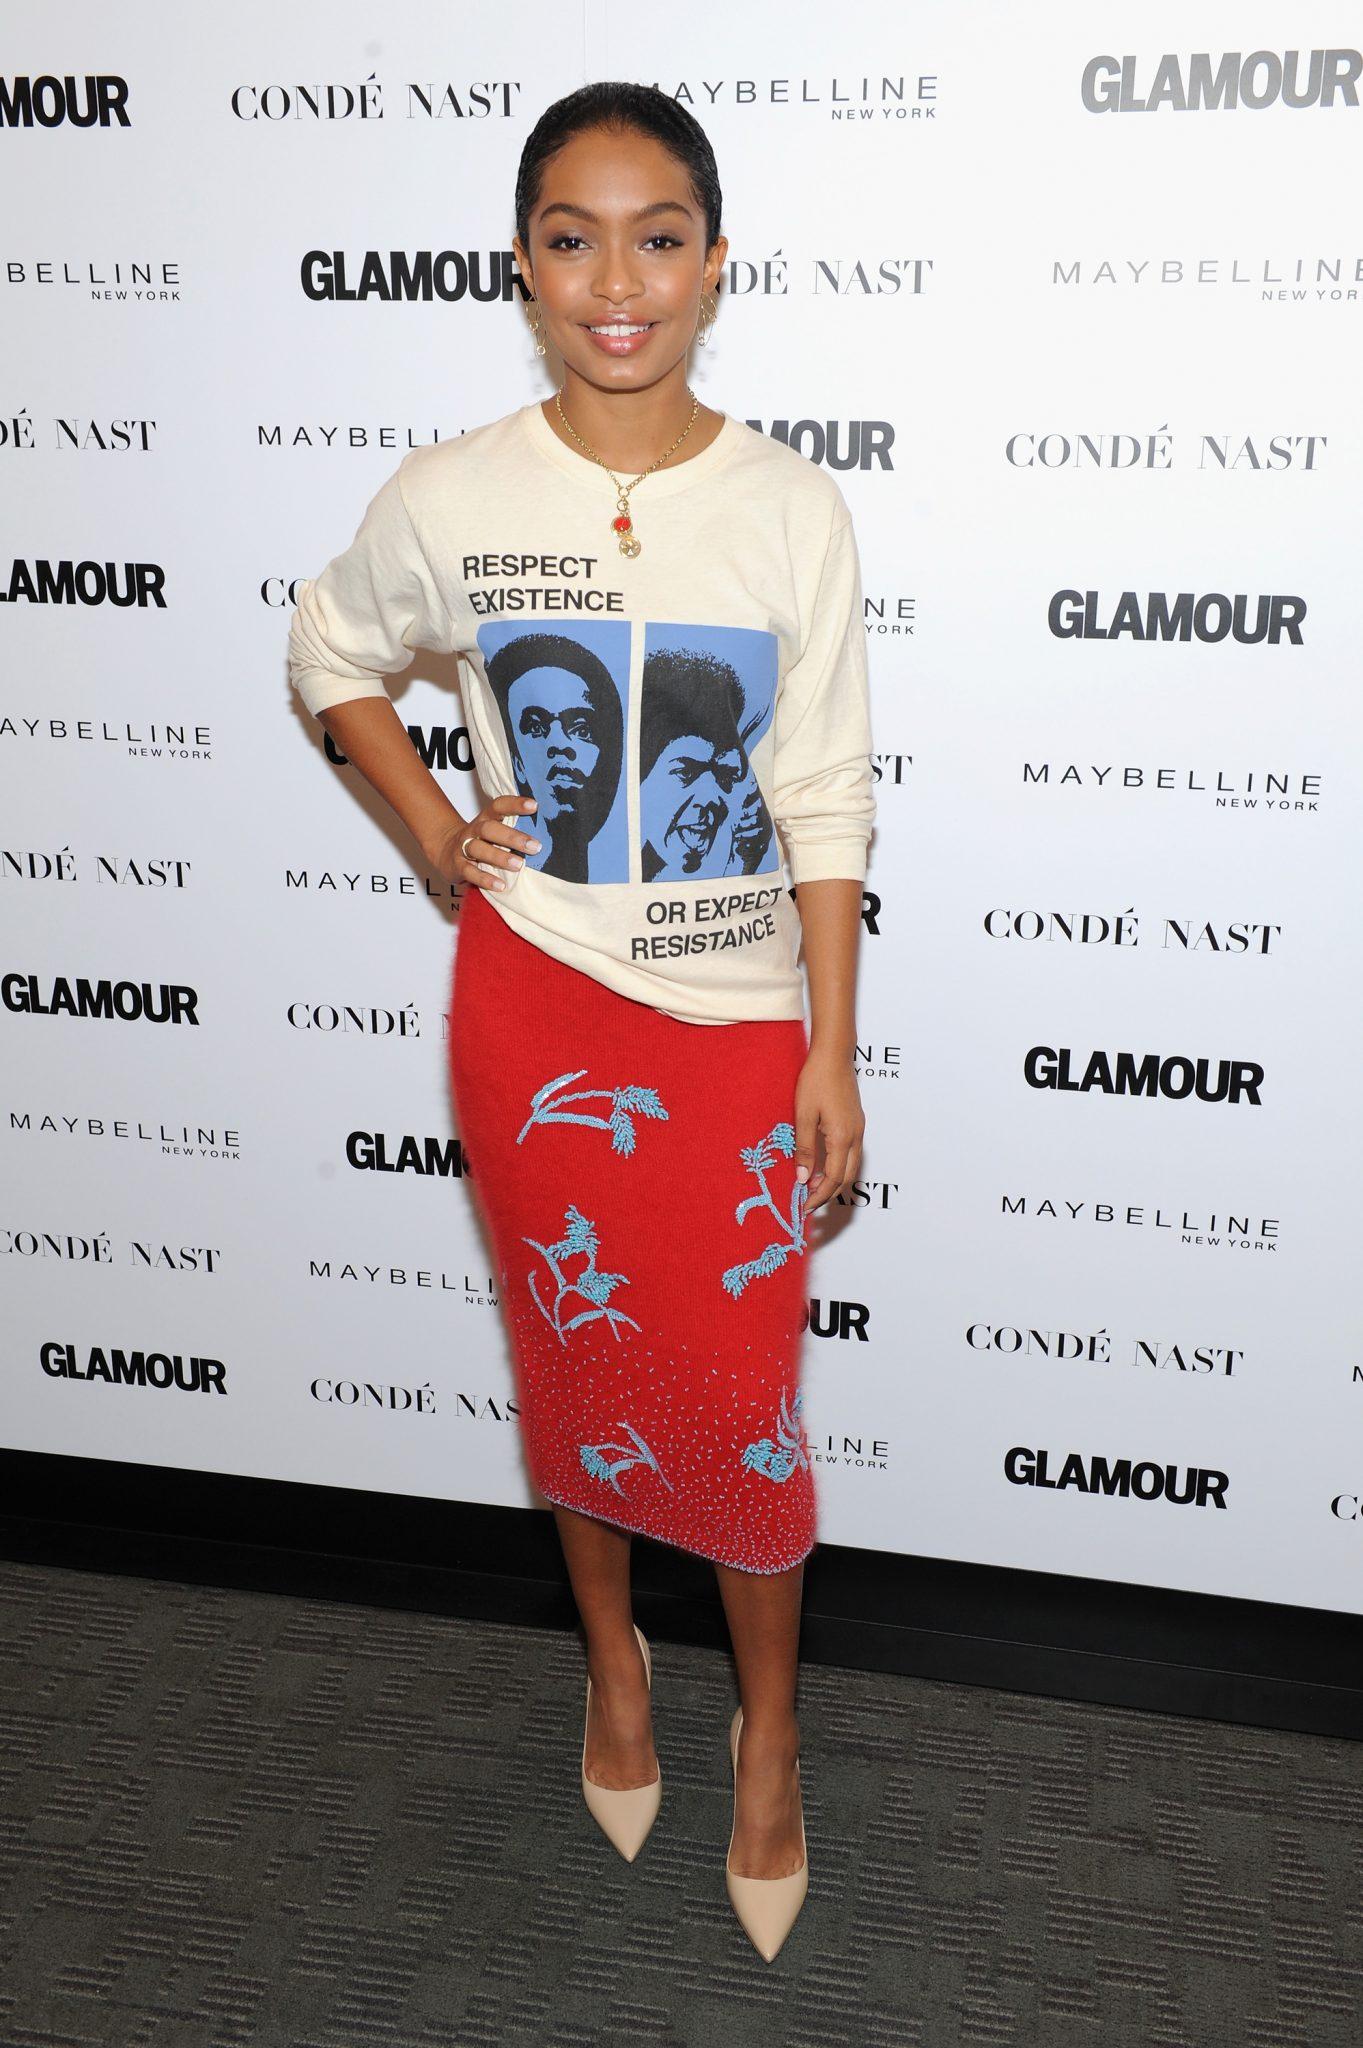 Wardrobe Breakdown: Yara Shadidi At Glamour's The Girl Project In NYC